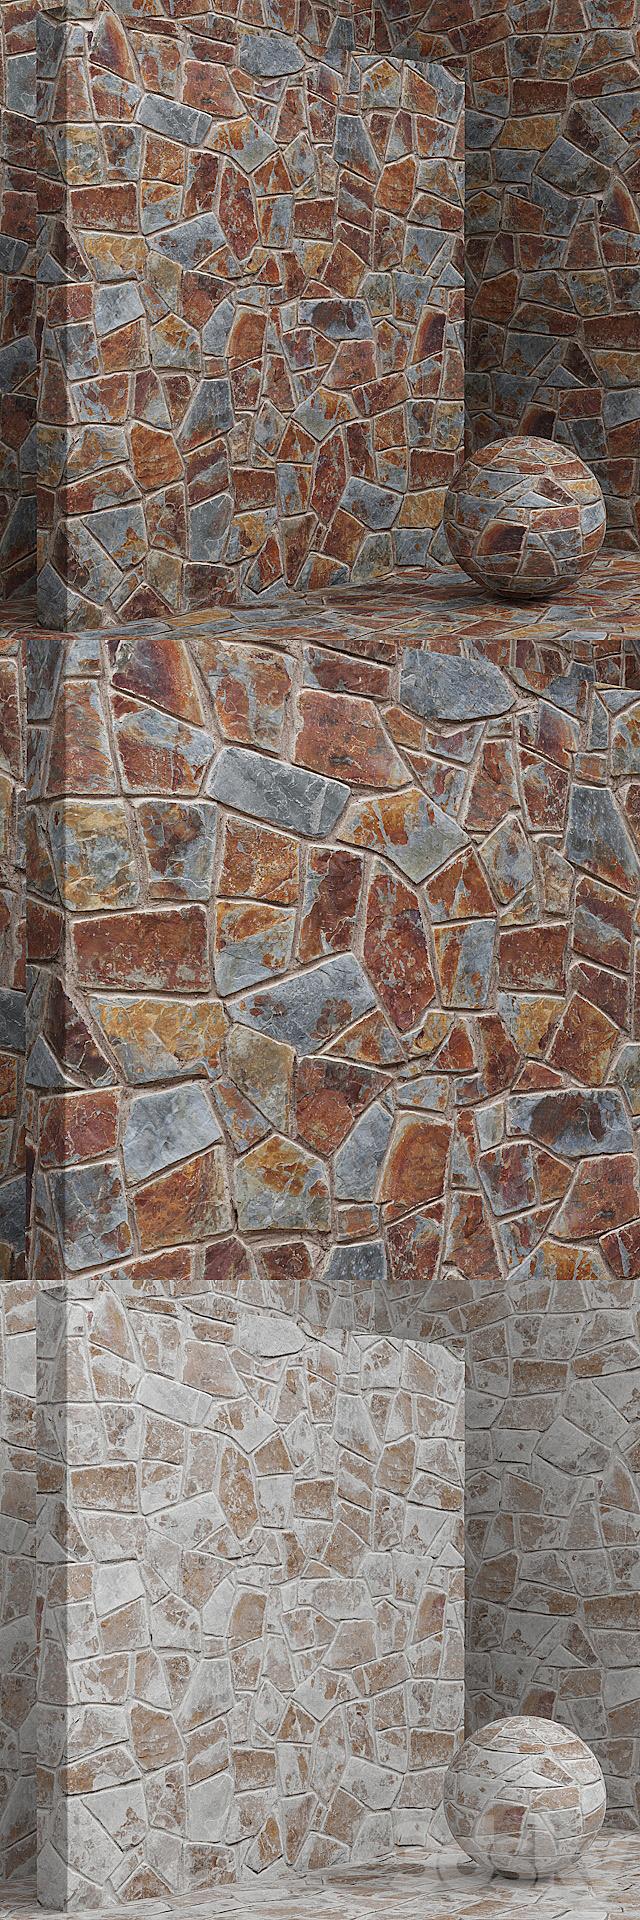 Material (seamless) - stone, masonry set 11